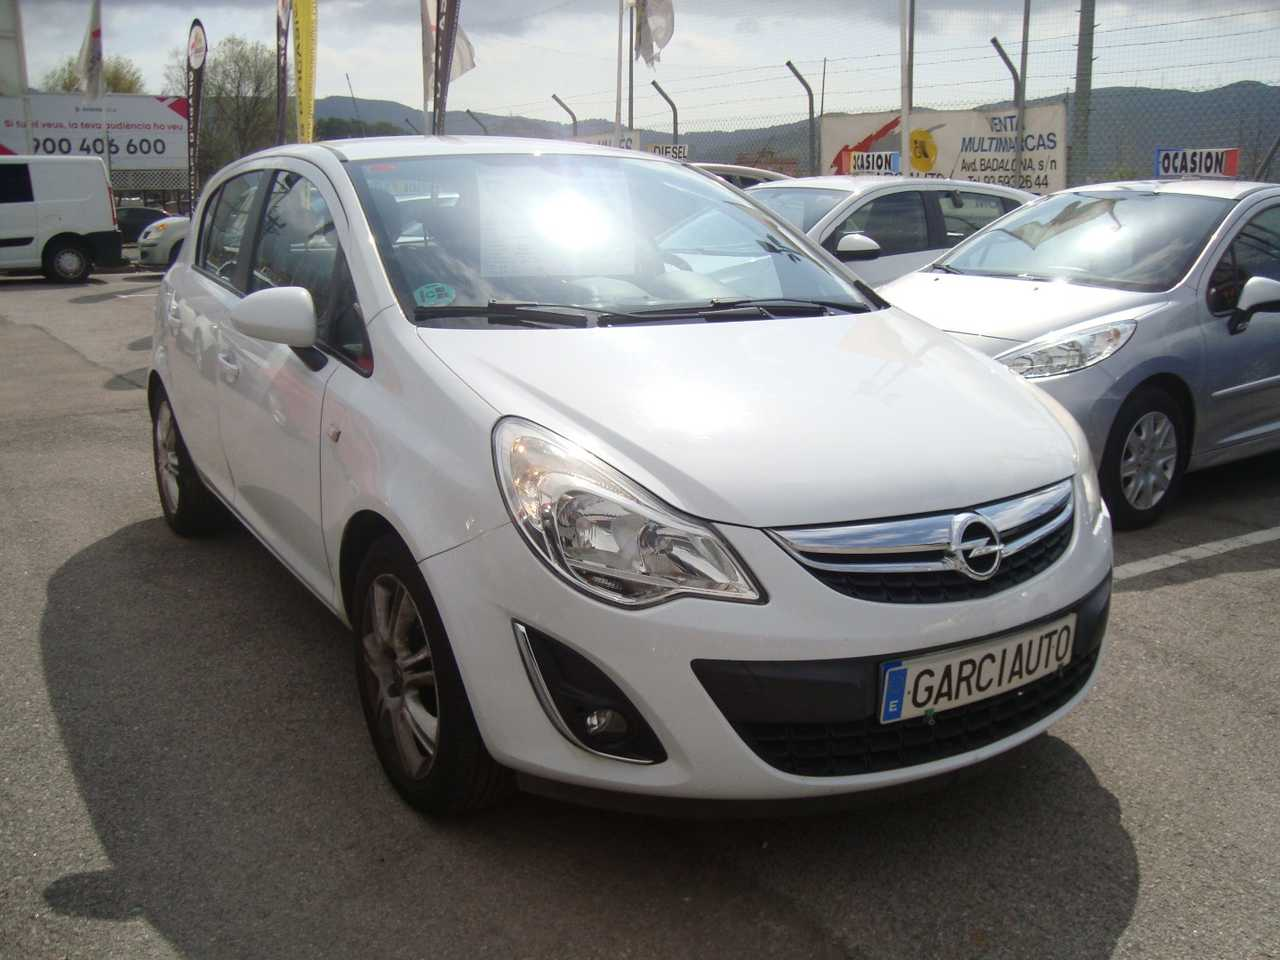 Opel Corsa 1.4 Cosmo 100 cv 5 p   - Foto 1